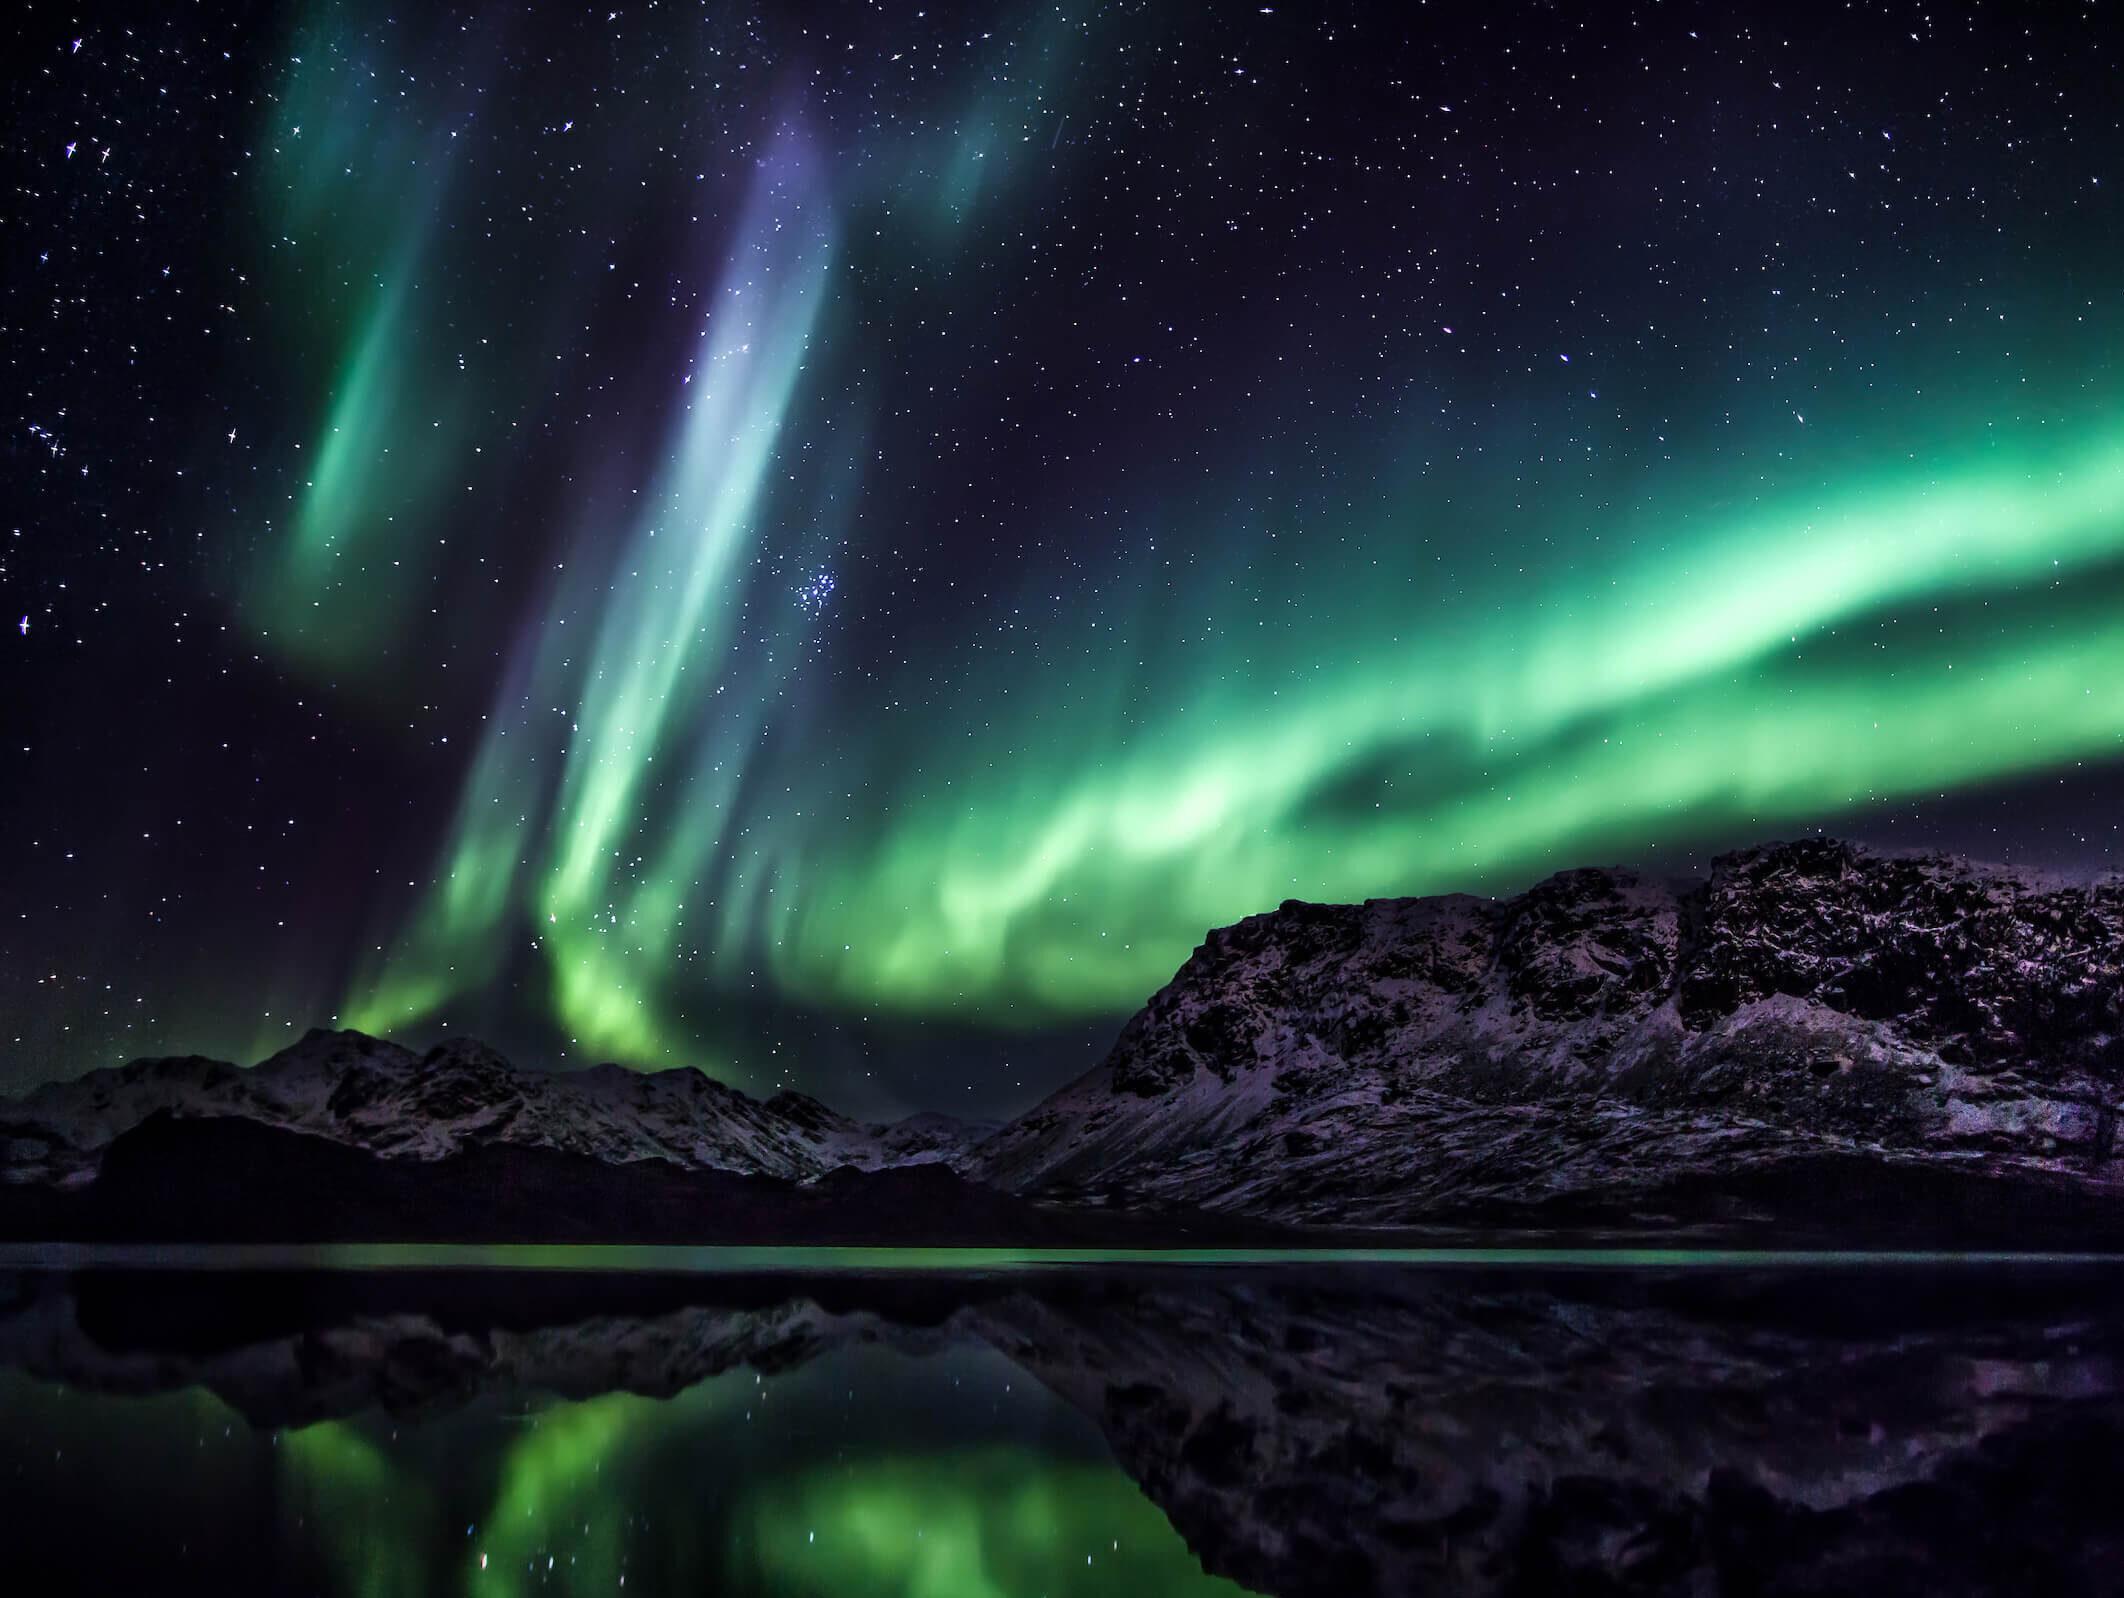 northern-lights-by-mads-pihl-17